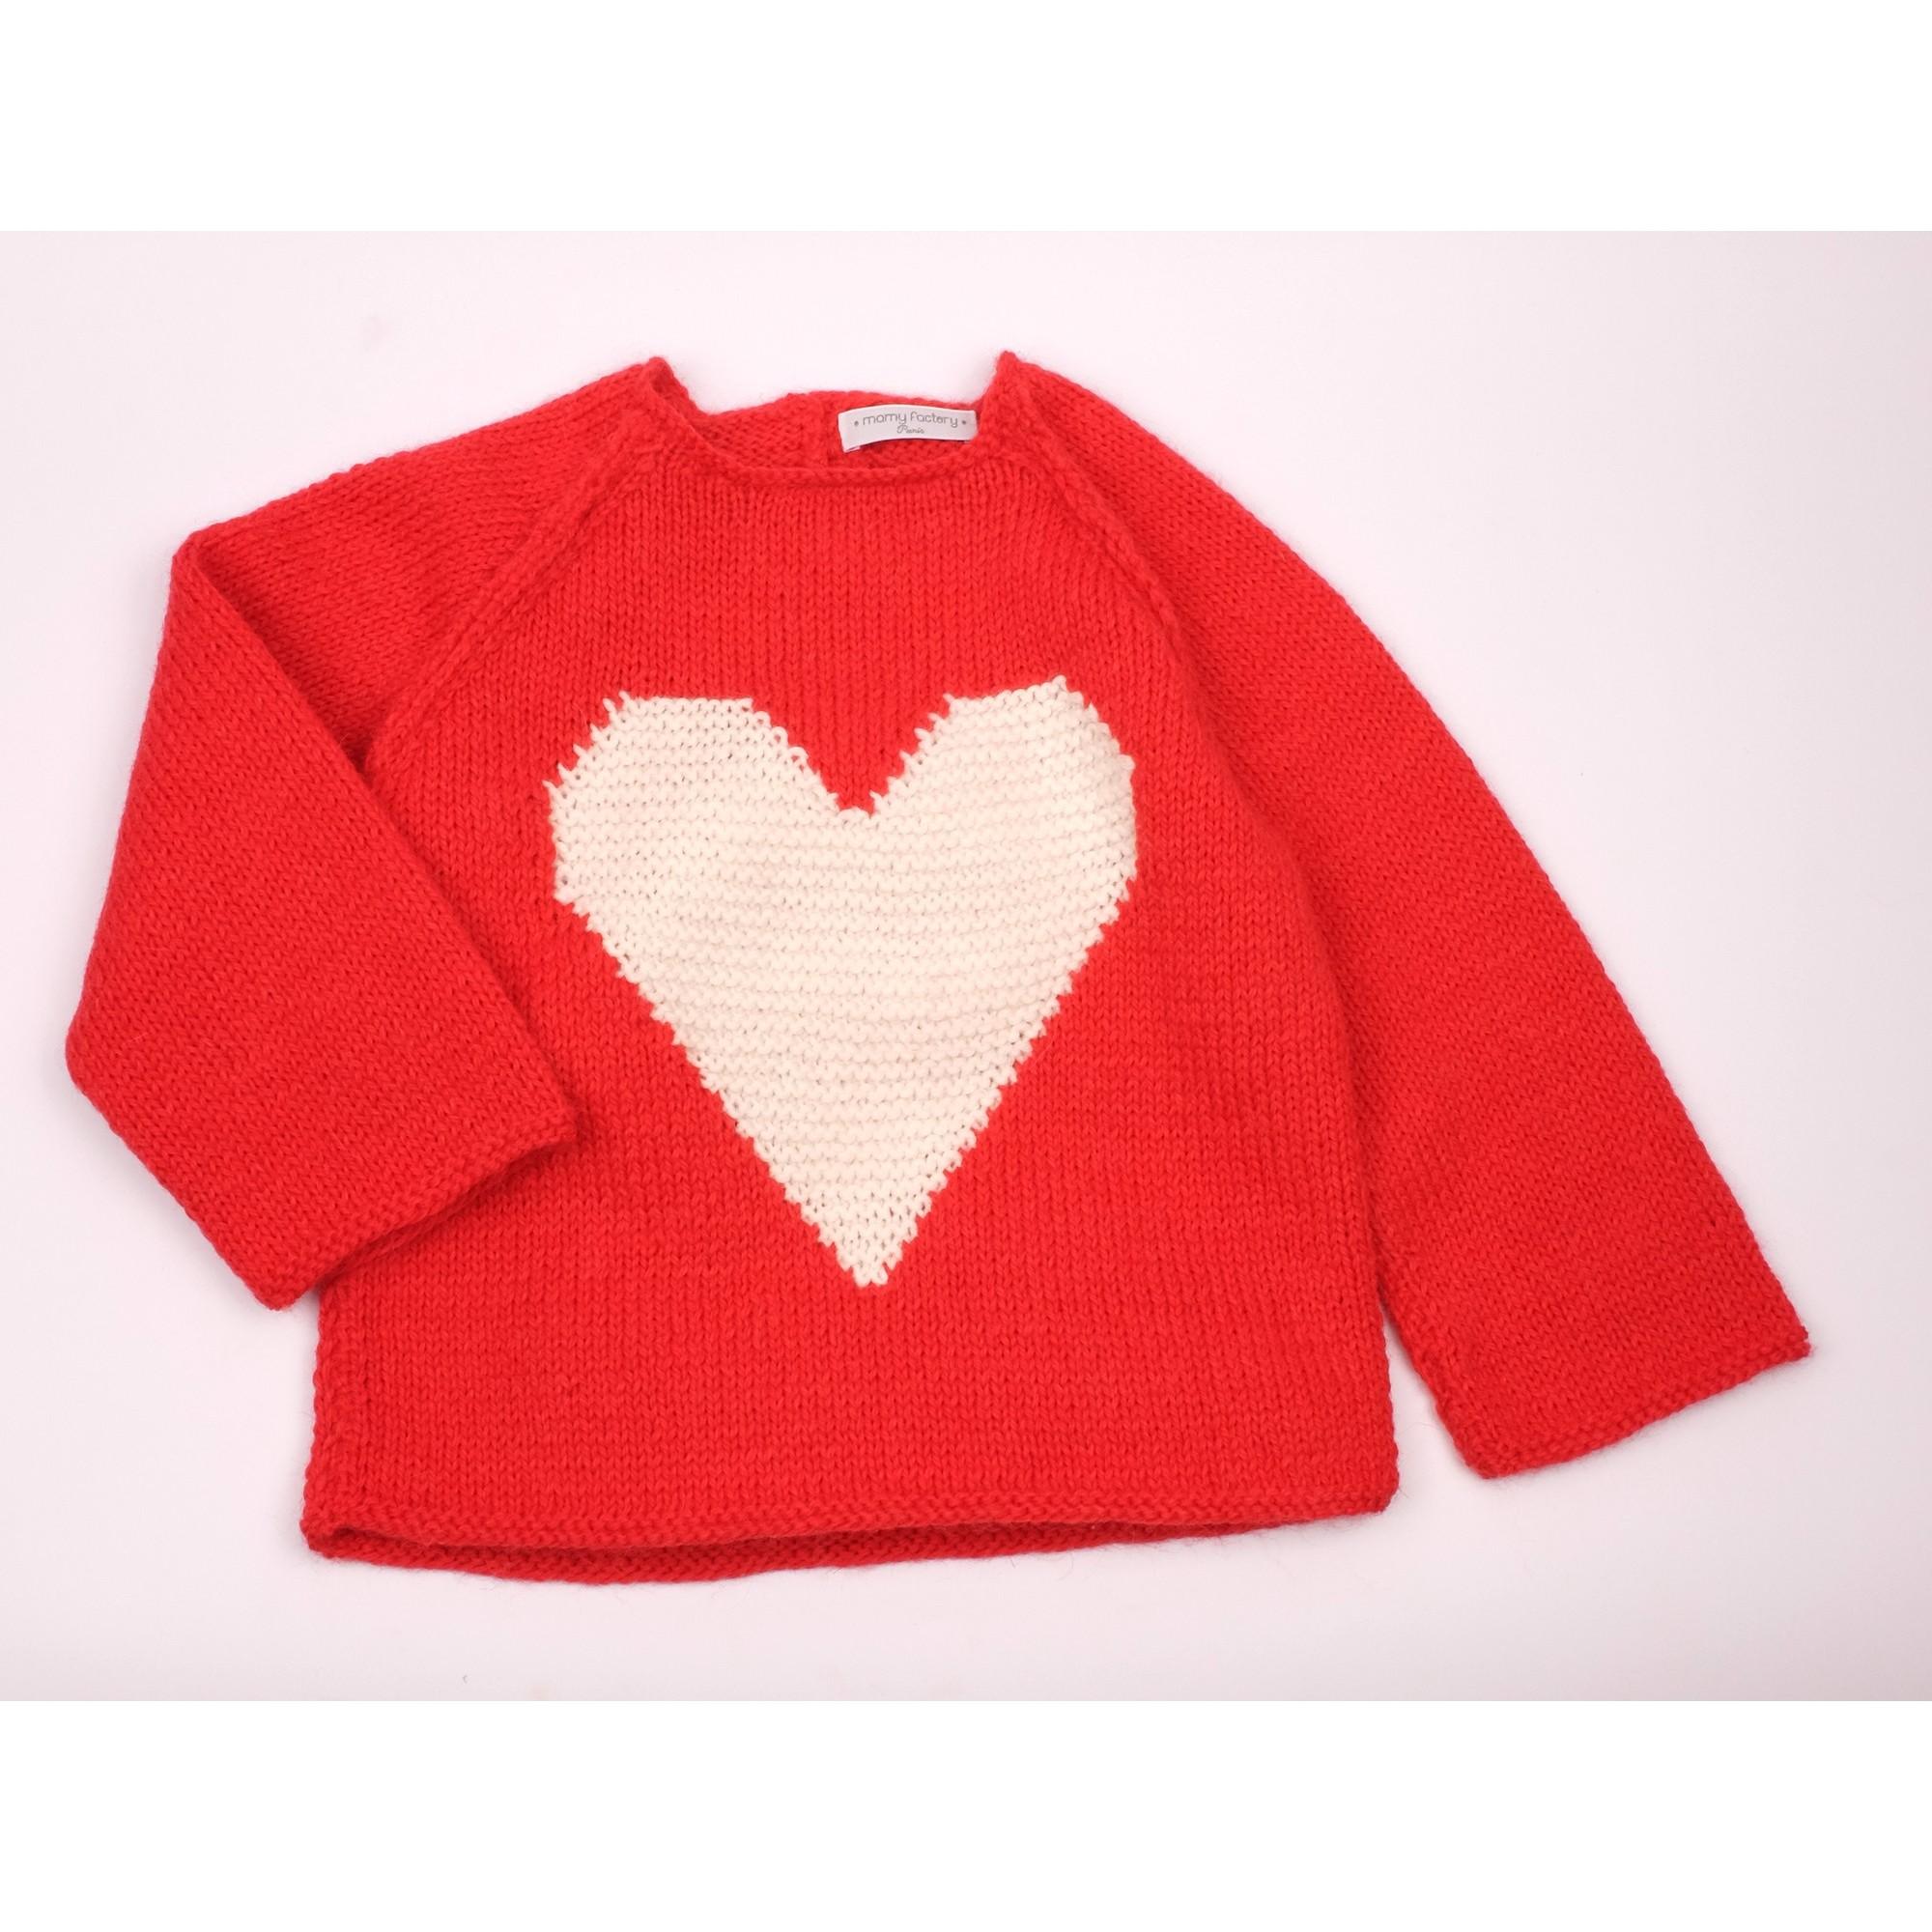 Pull Agénor rouge coeur blanc laine alpaga 2